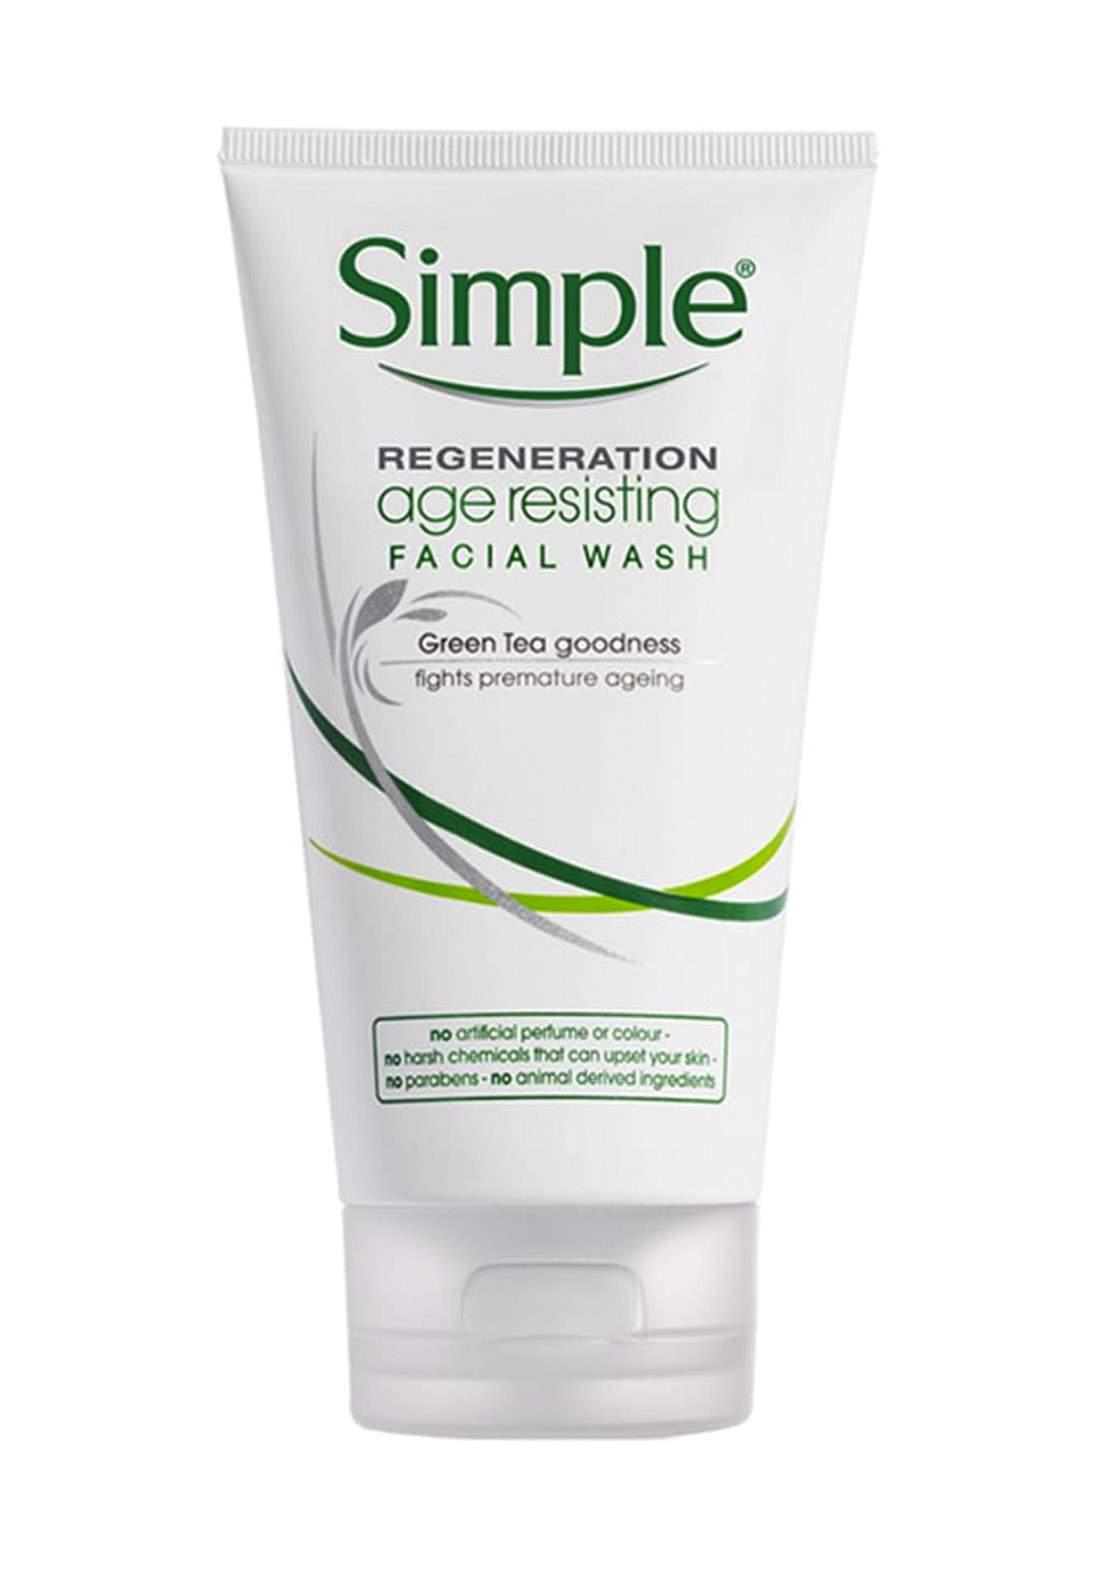 Simple (108332) Regeneration Age Resisting Facial Wash 150ml غسول الوجه مضاد للتجاعيد